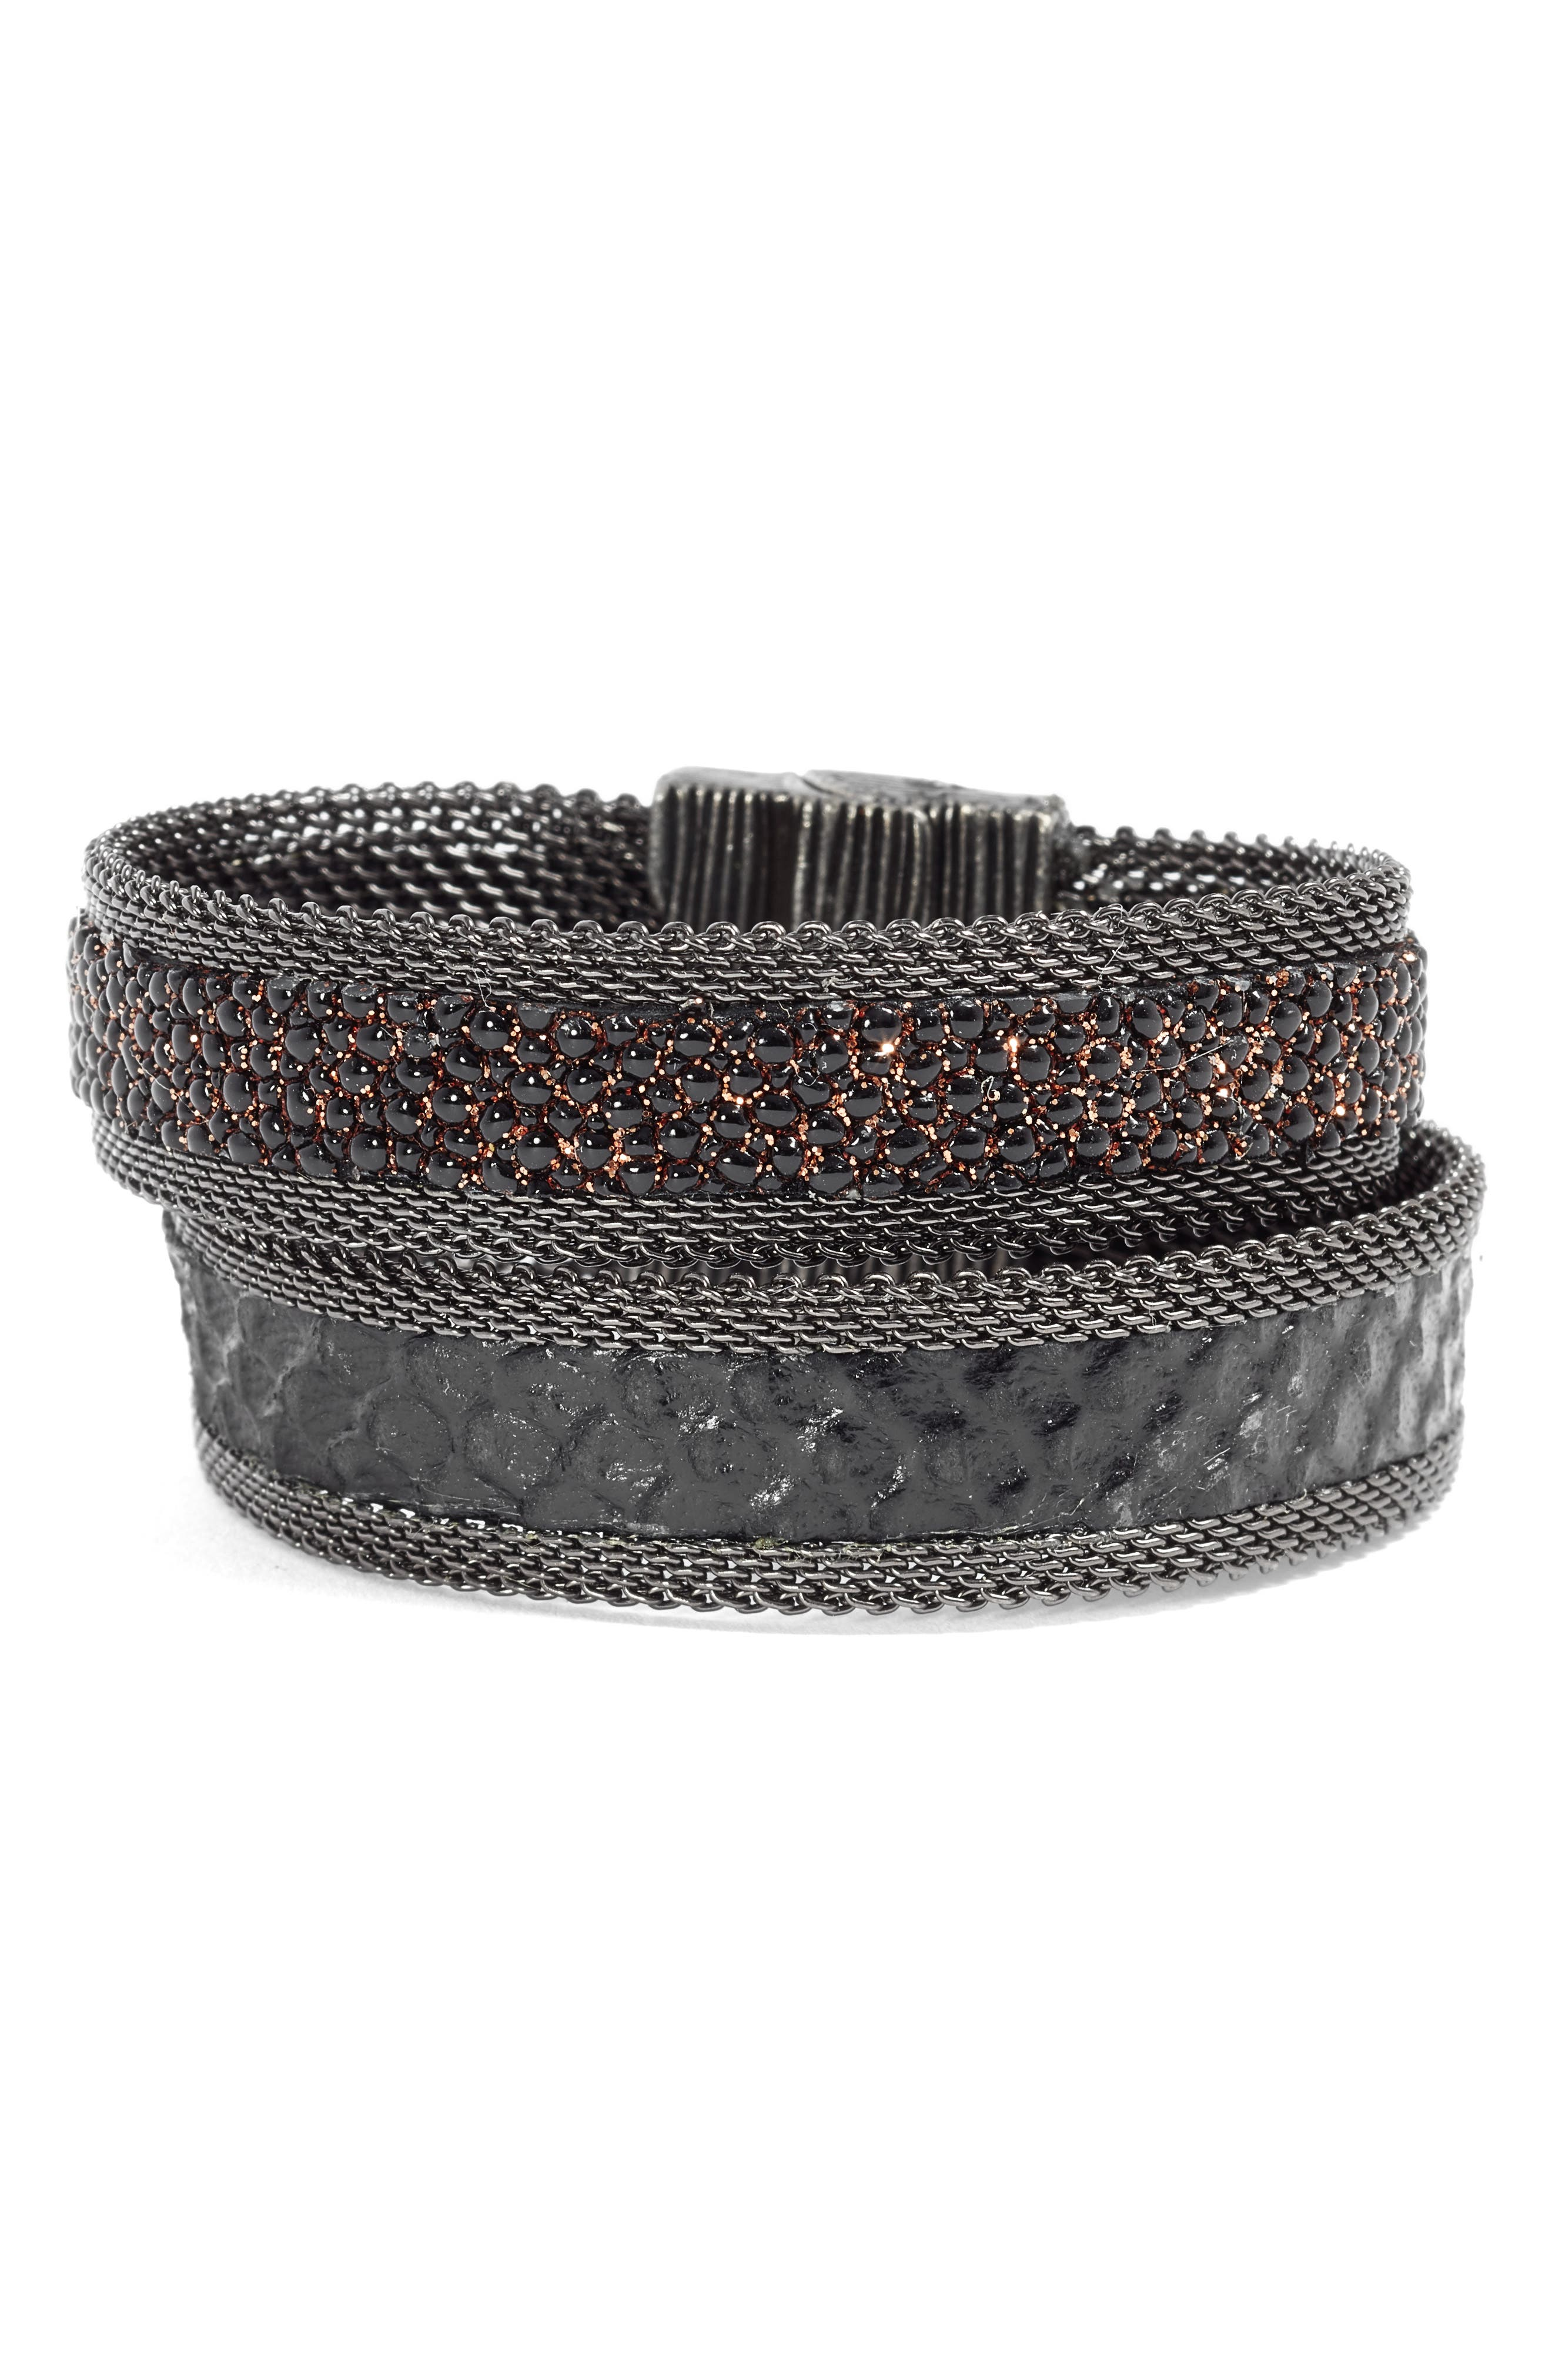 Main Image - Cynthia Desser Shimmer Stingray & Snakeskin Bracelet